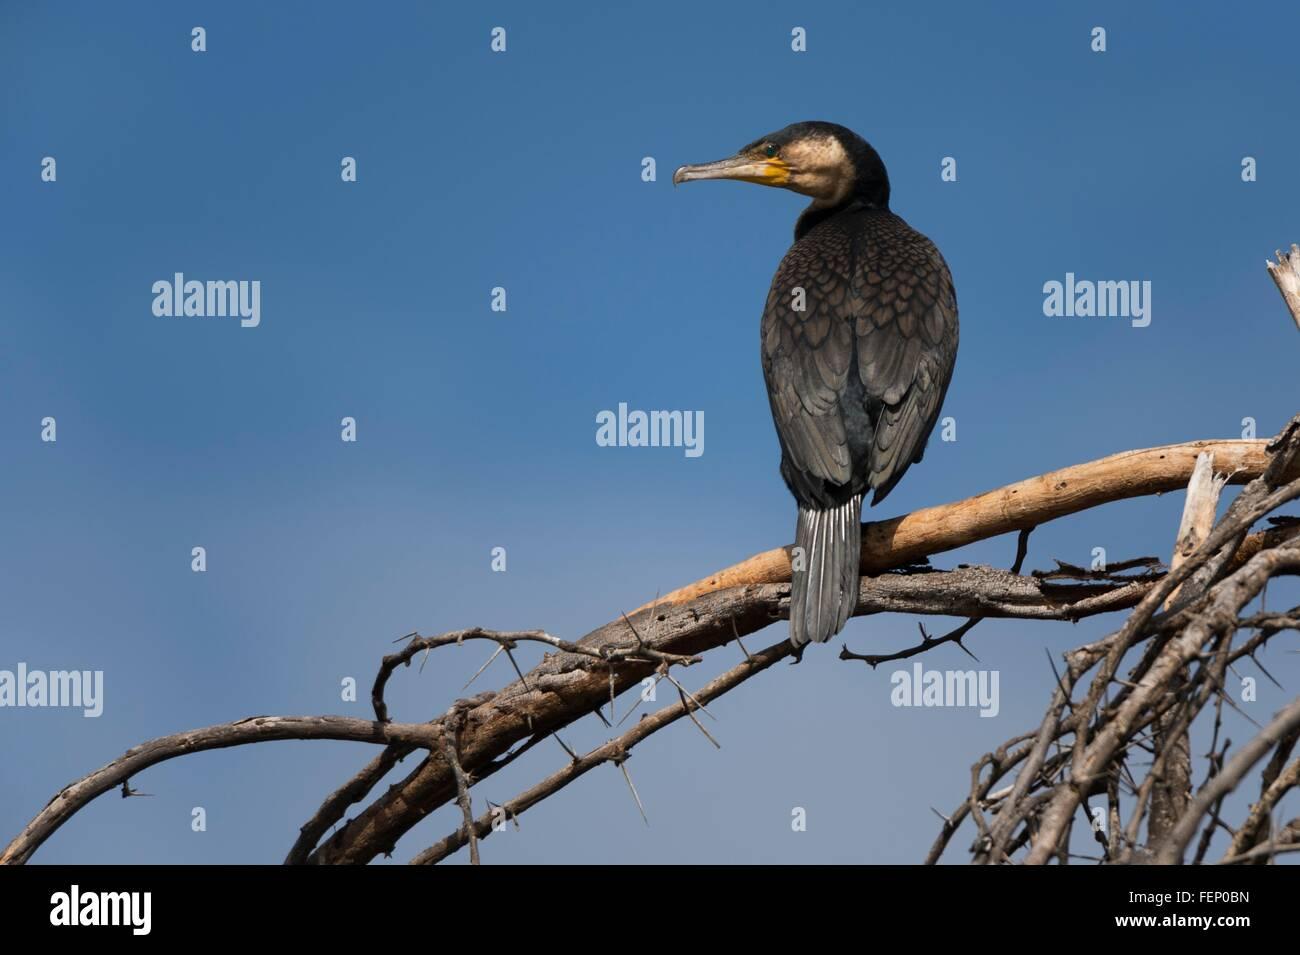 Great cormorant (Phalocrocorax carbo), Lake Naivasha, Kenya, Africa - Stock Image